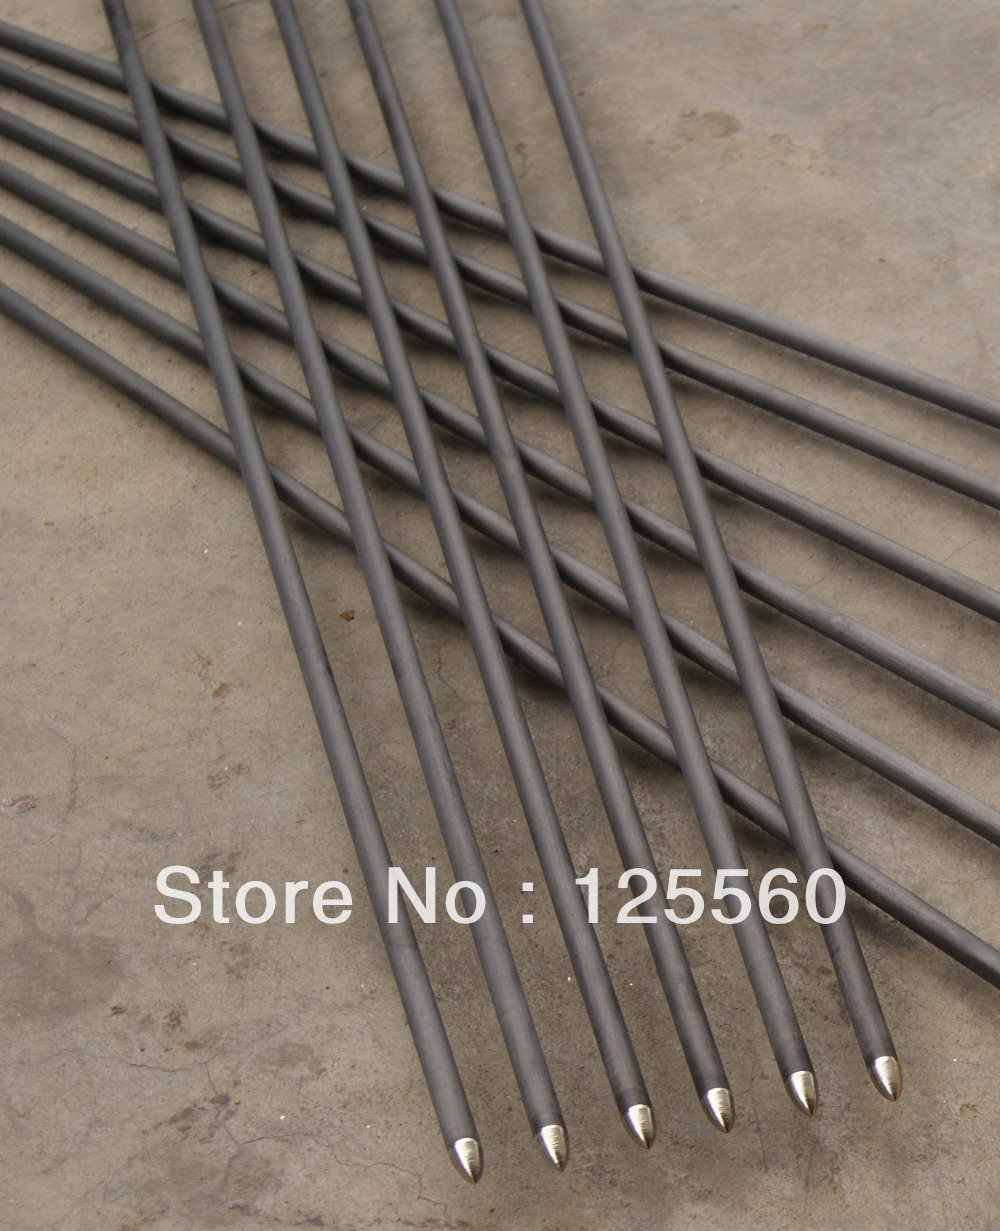 Gratis verzending 12 stks carbon pijl kalkoenveer ID 4.2mm as lengte - Jacht - Foto 2